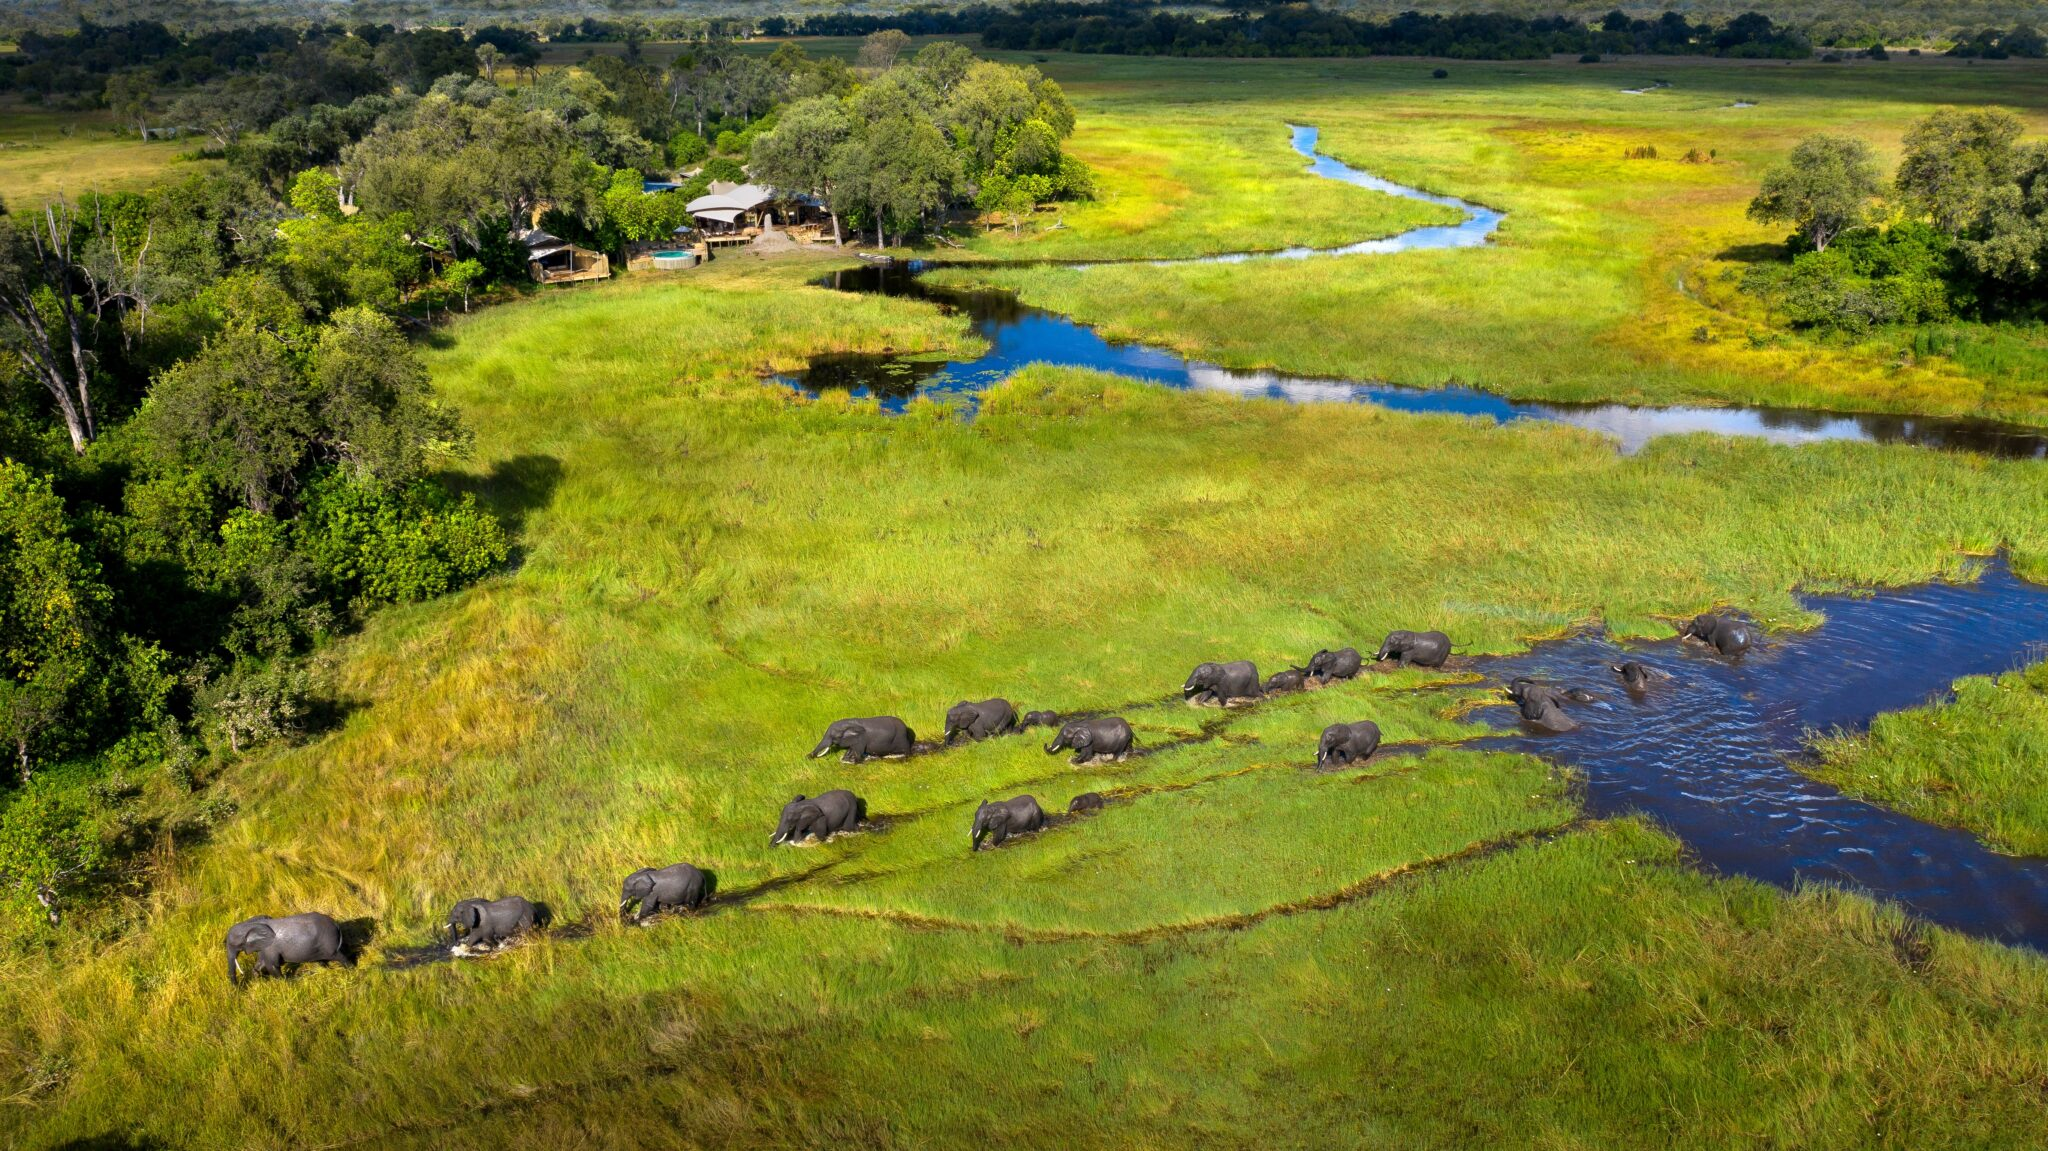 Reclaiming the African Safari with Beks Ndlovu